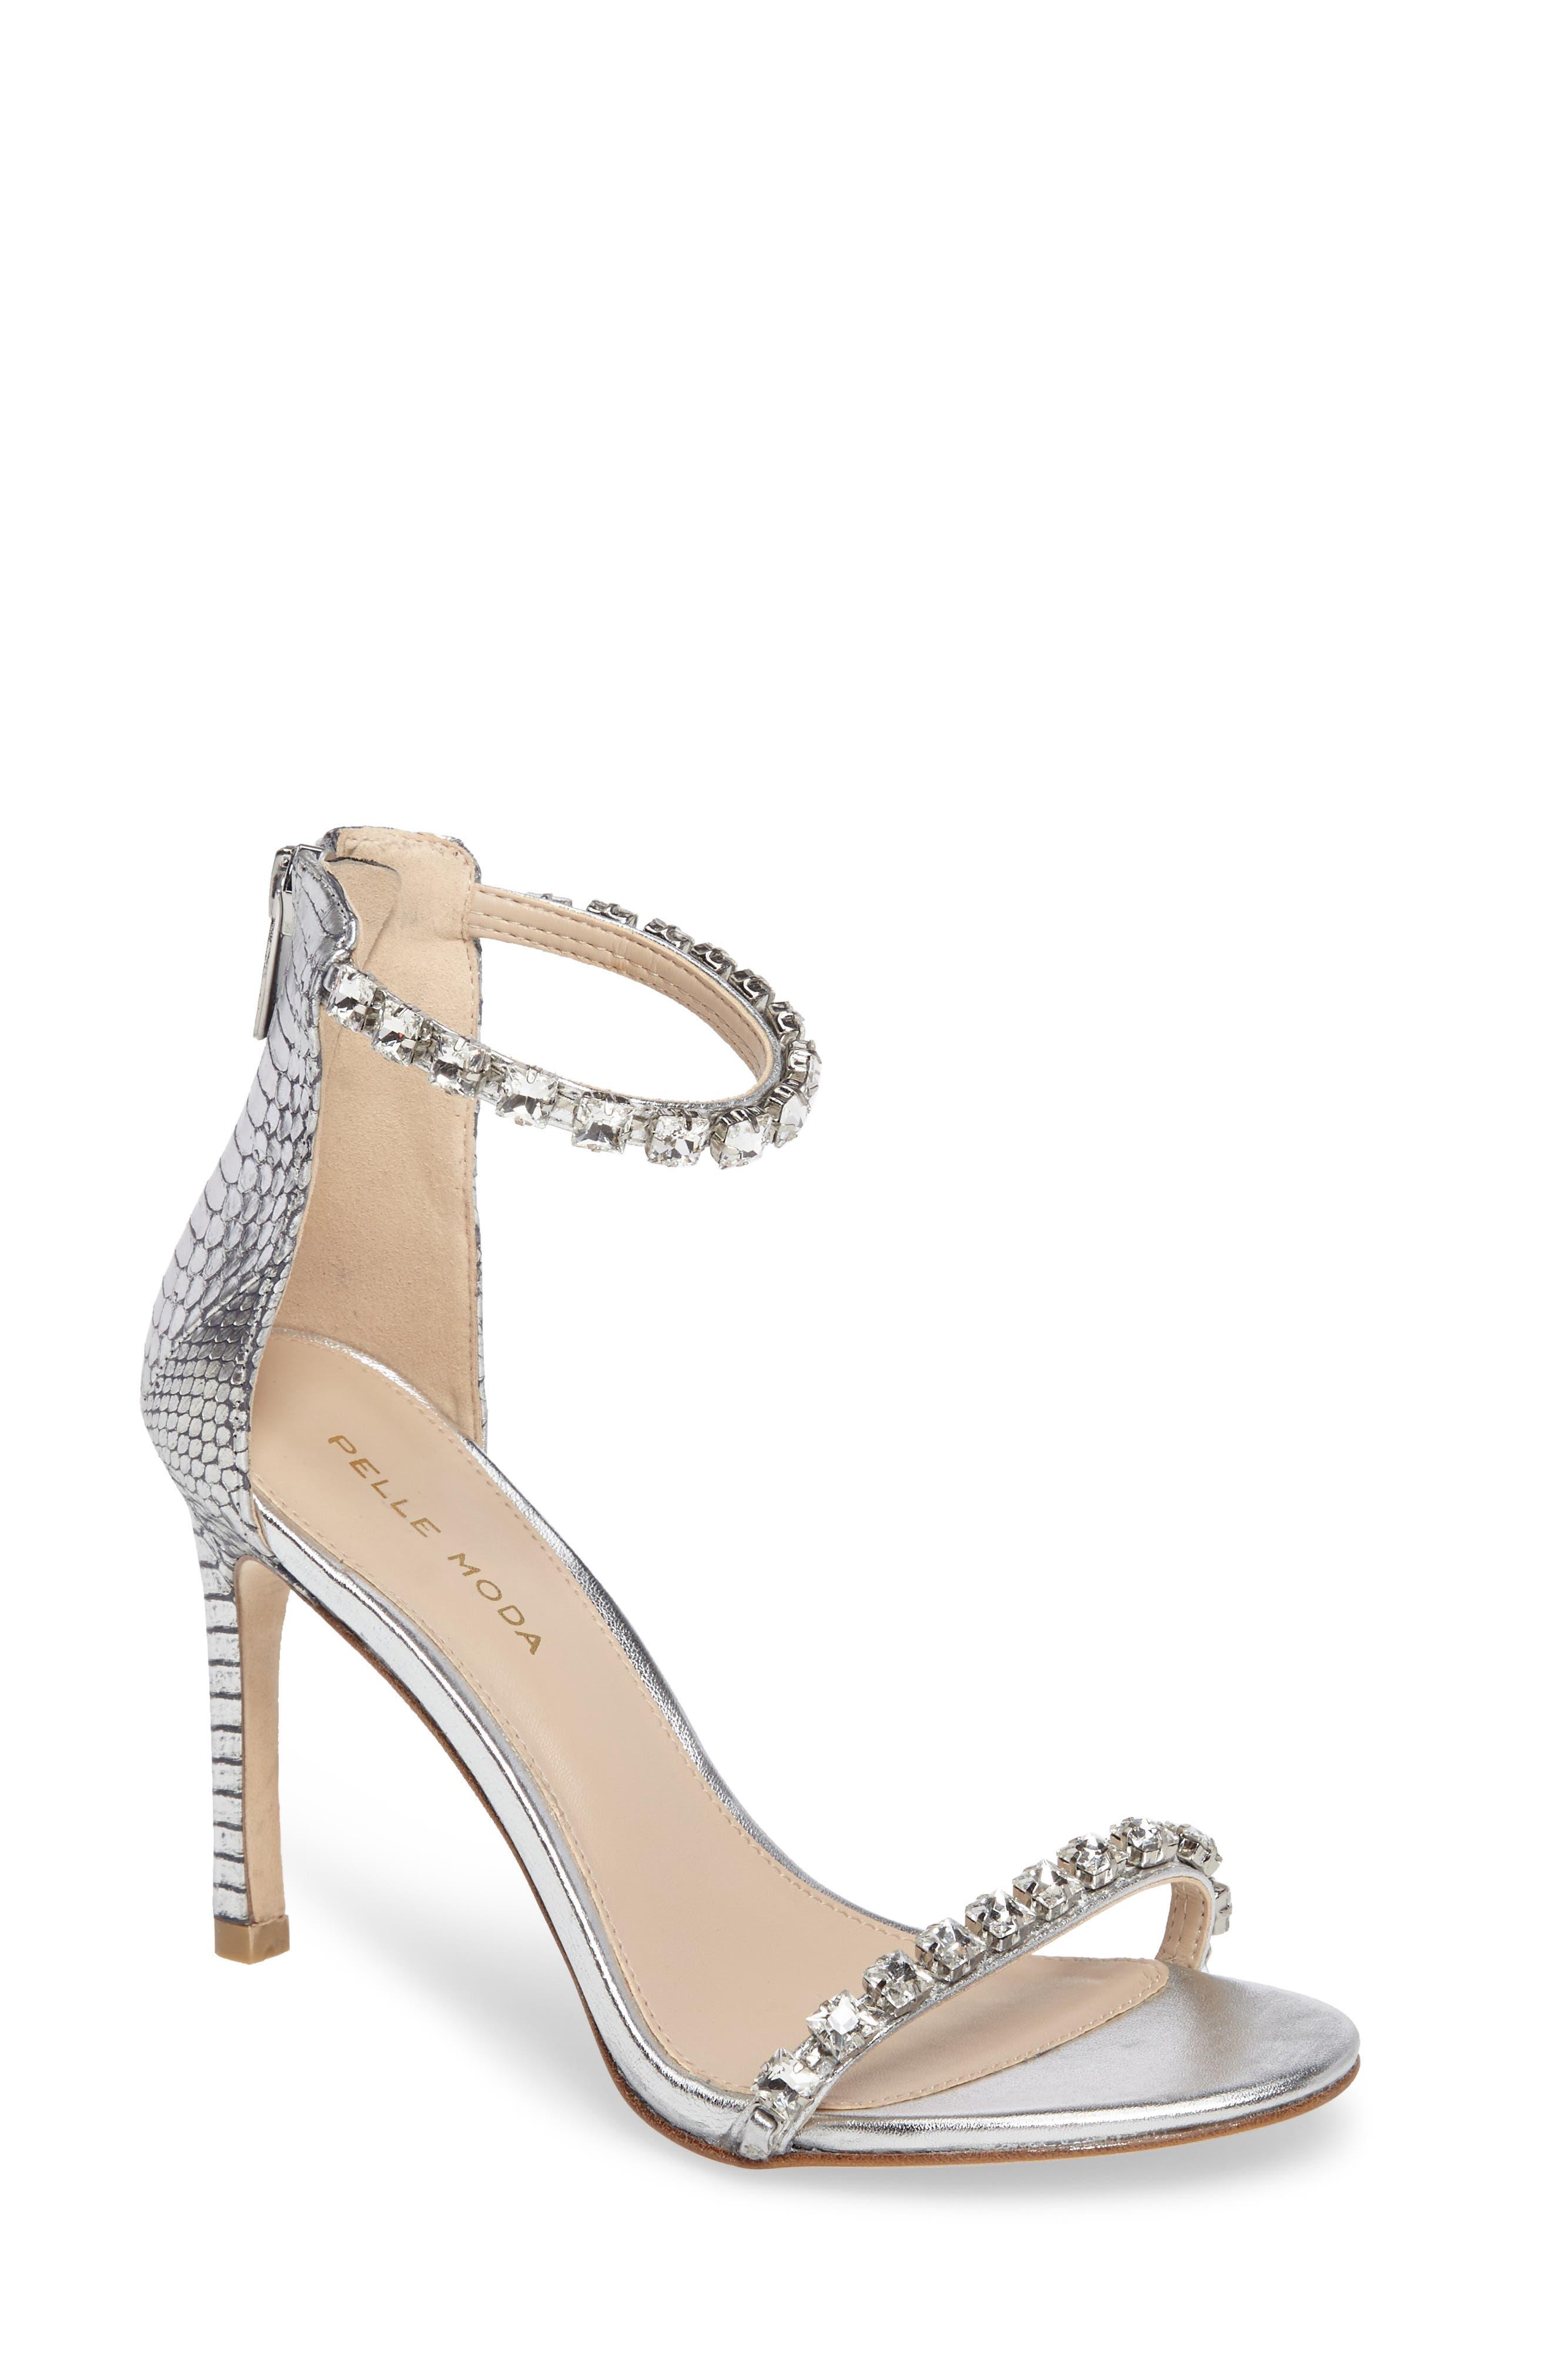 Pelle Moda Frisk Embellished Sandal (Women)